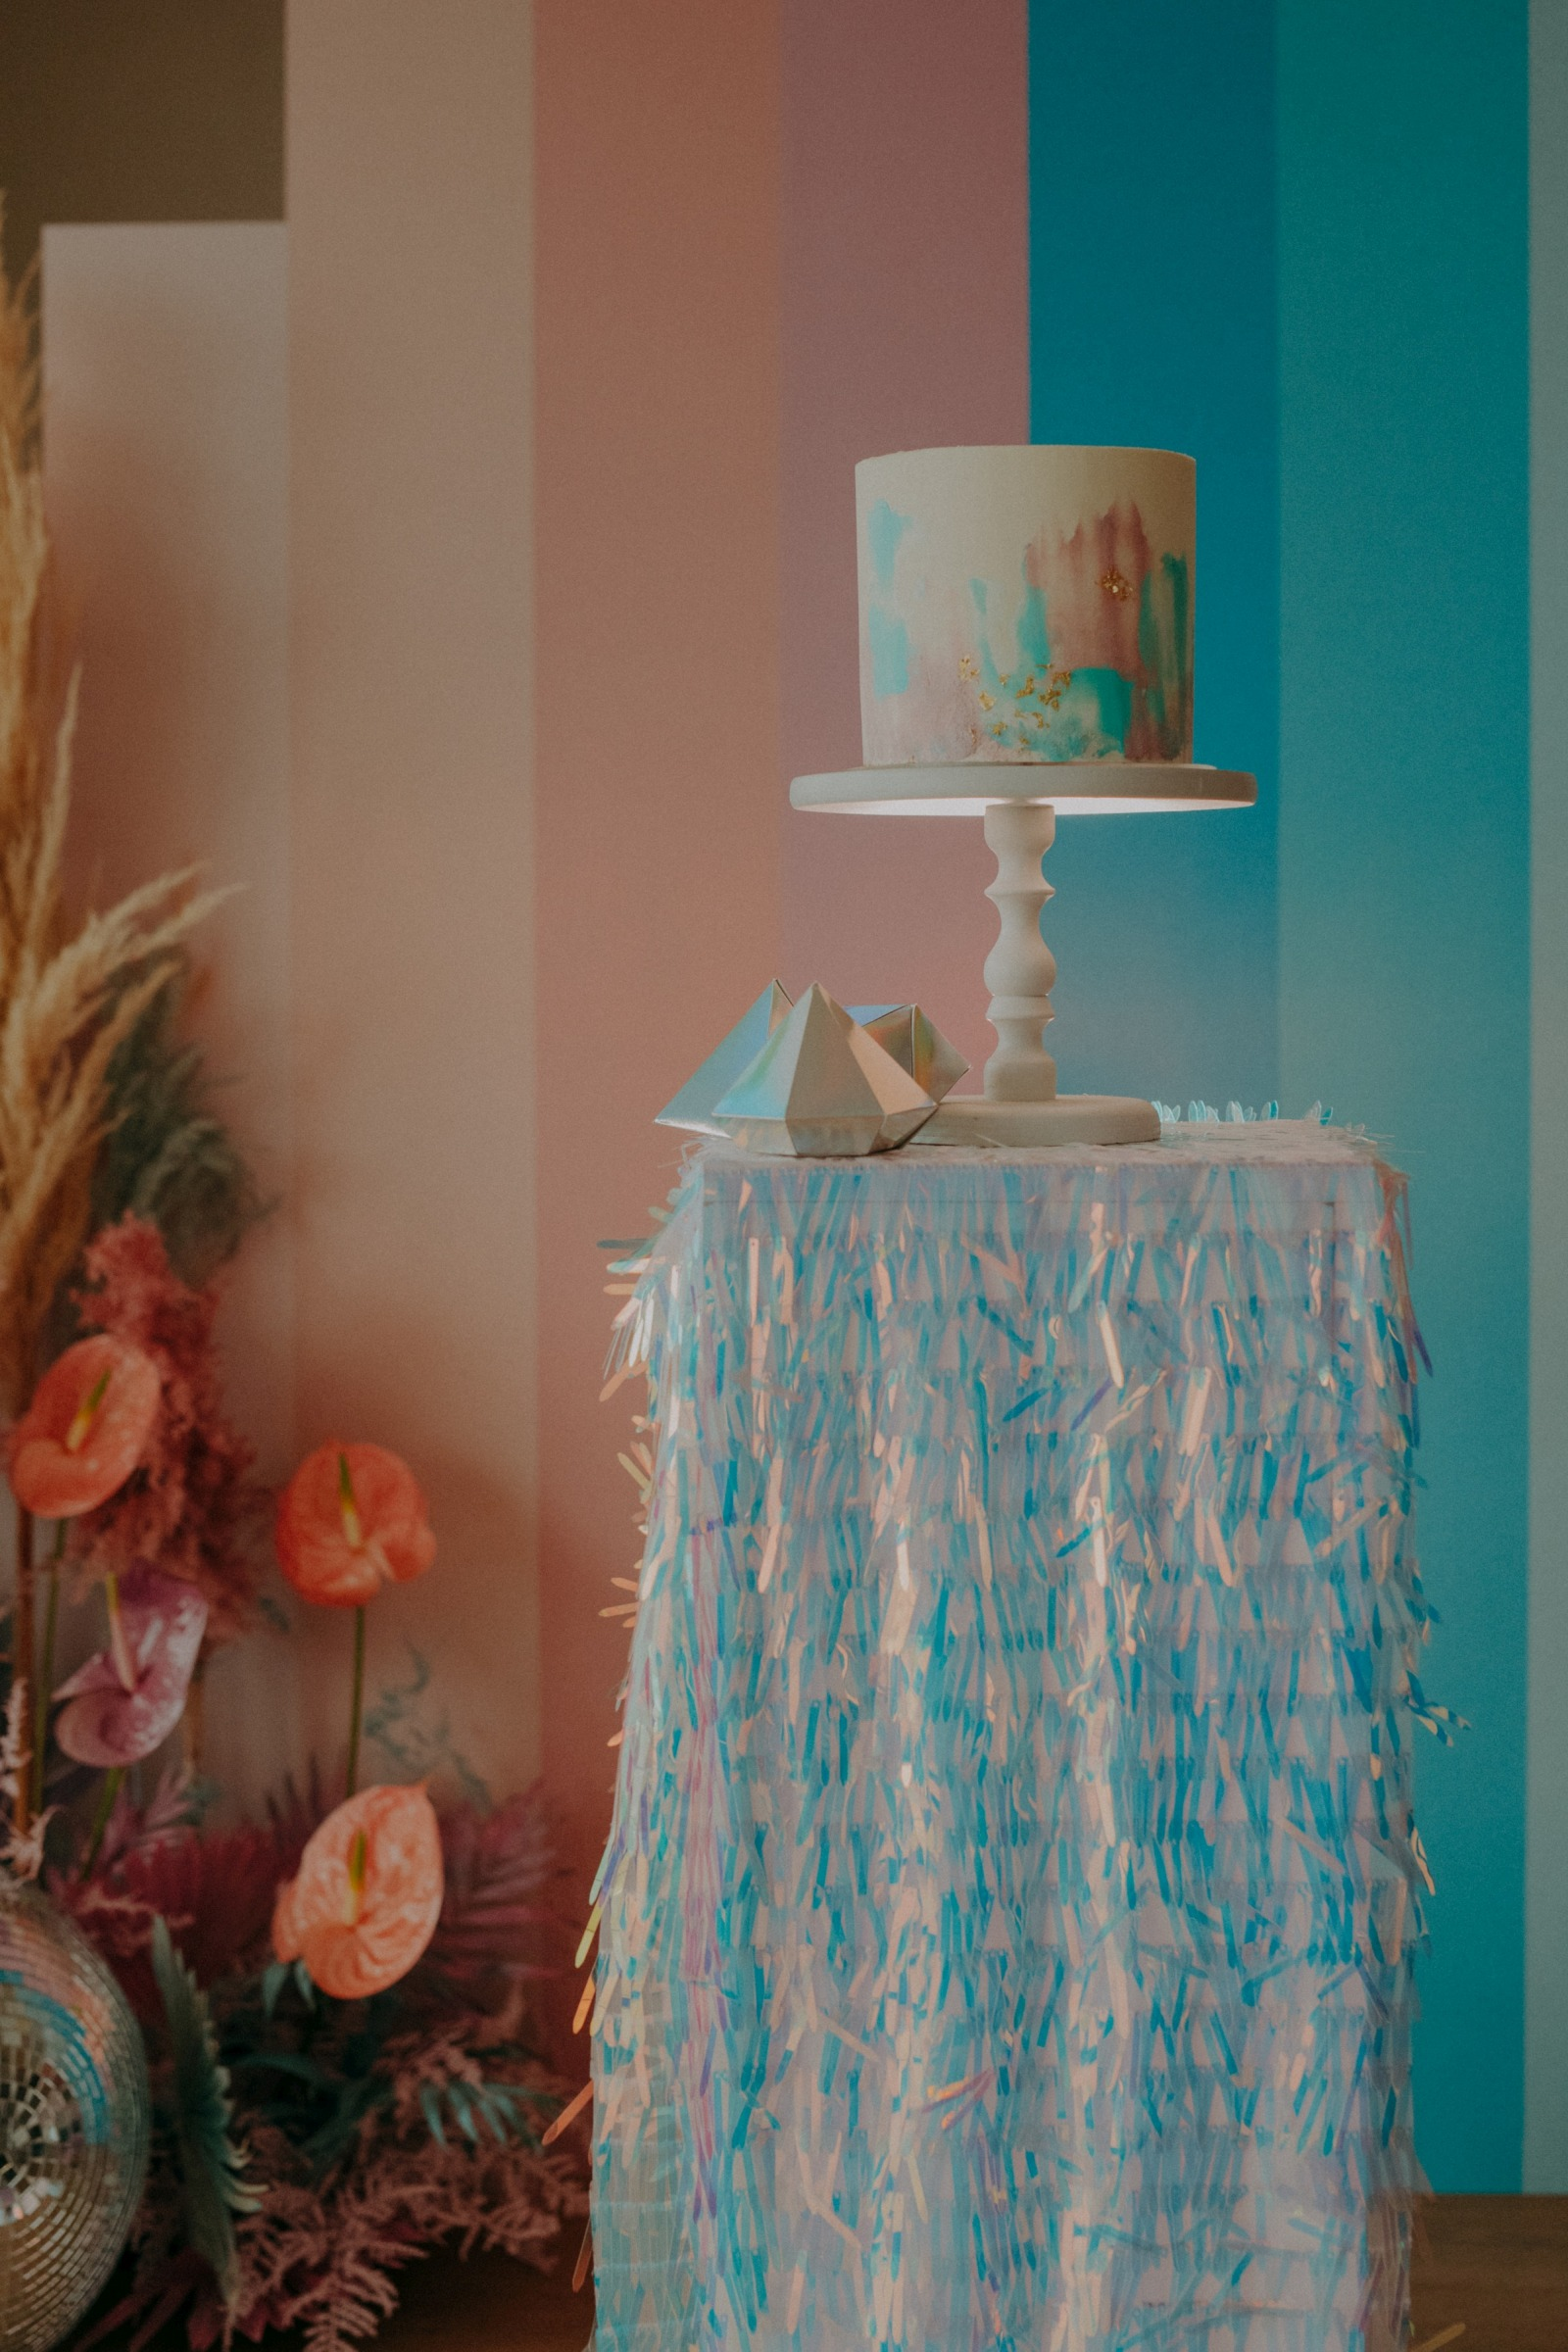 colourful pastel wedding - unconventional wedding - alternative wedding - sparkly wedding - small wedding cake - unique wedding cake